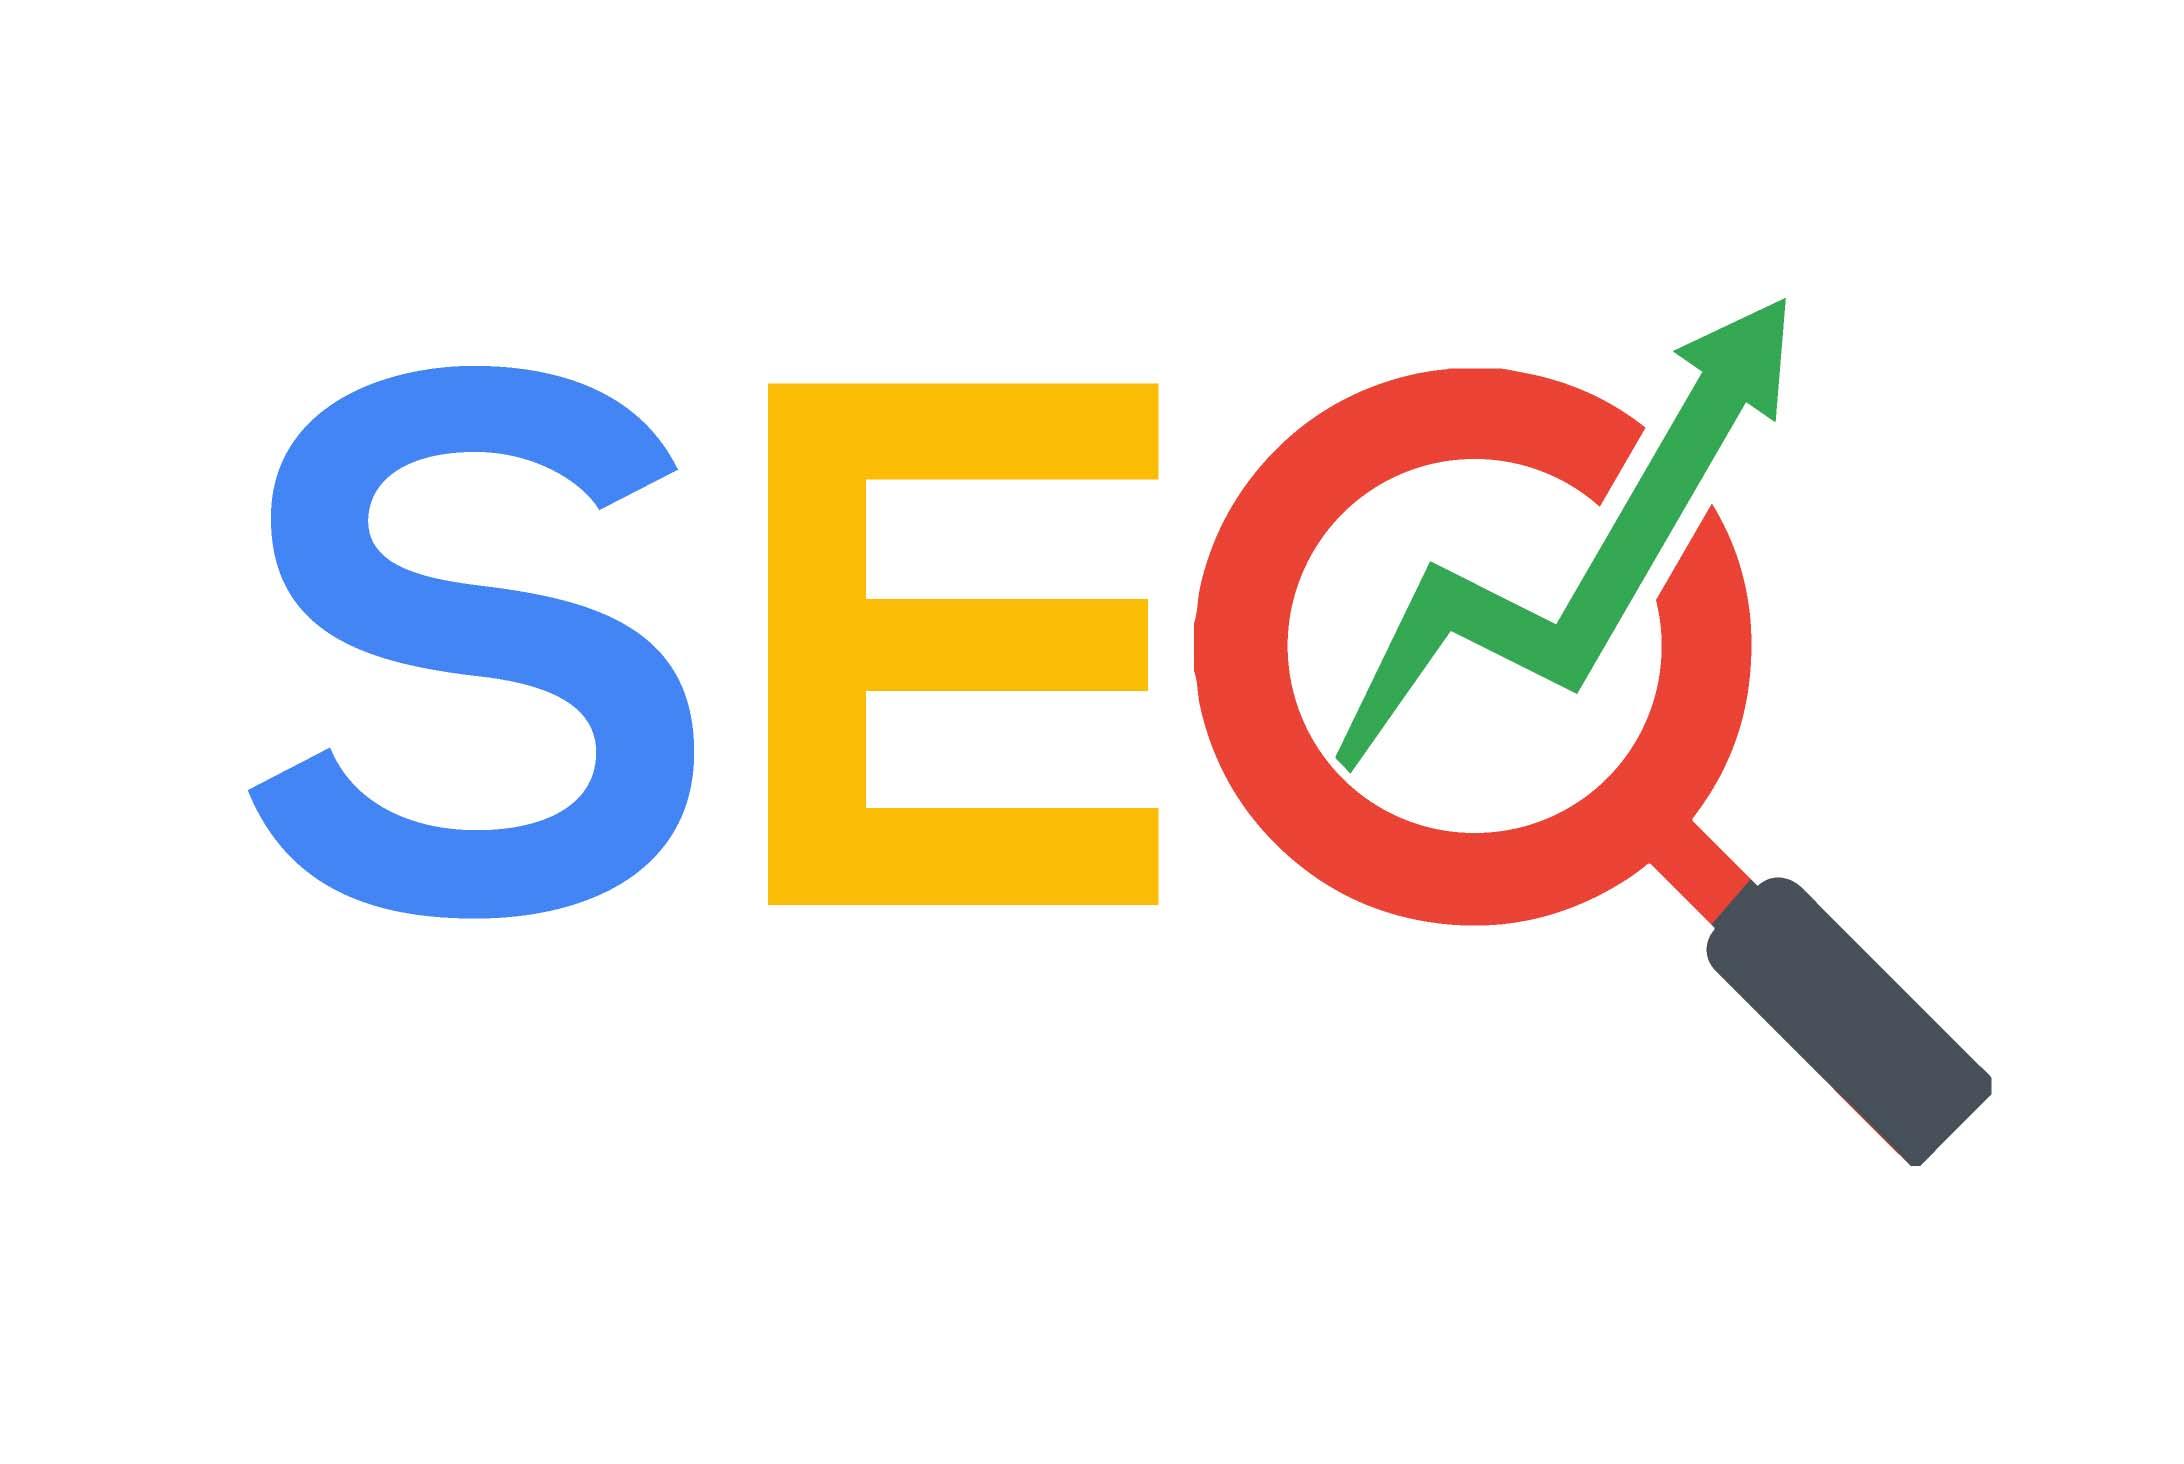 CT - Linking NEW method BOOSTS SEO Rank on Google